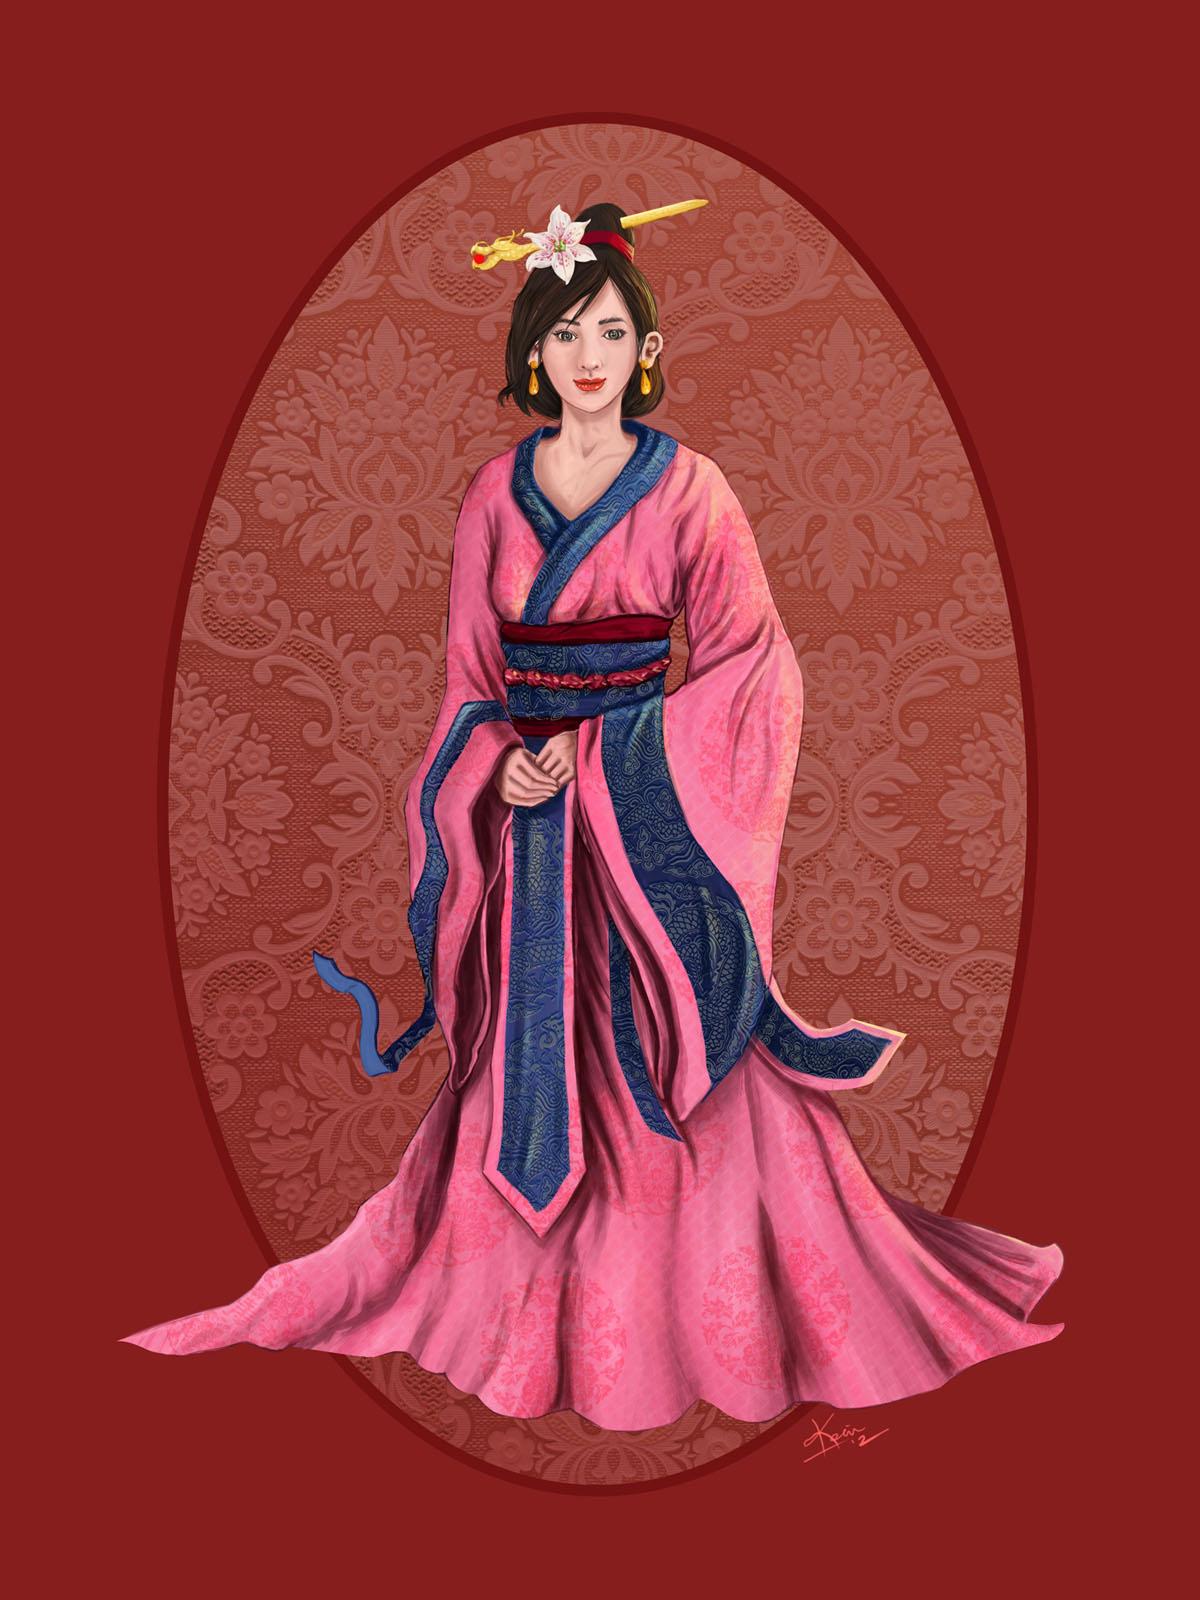 Fa Mulan by kevywk on DeviantArt